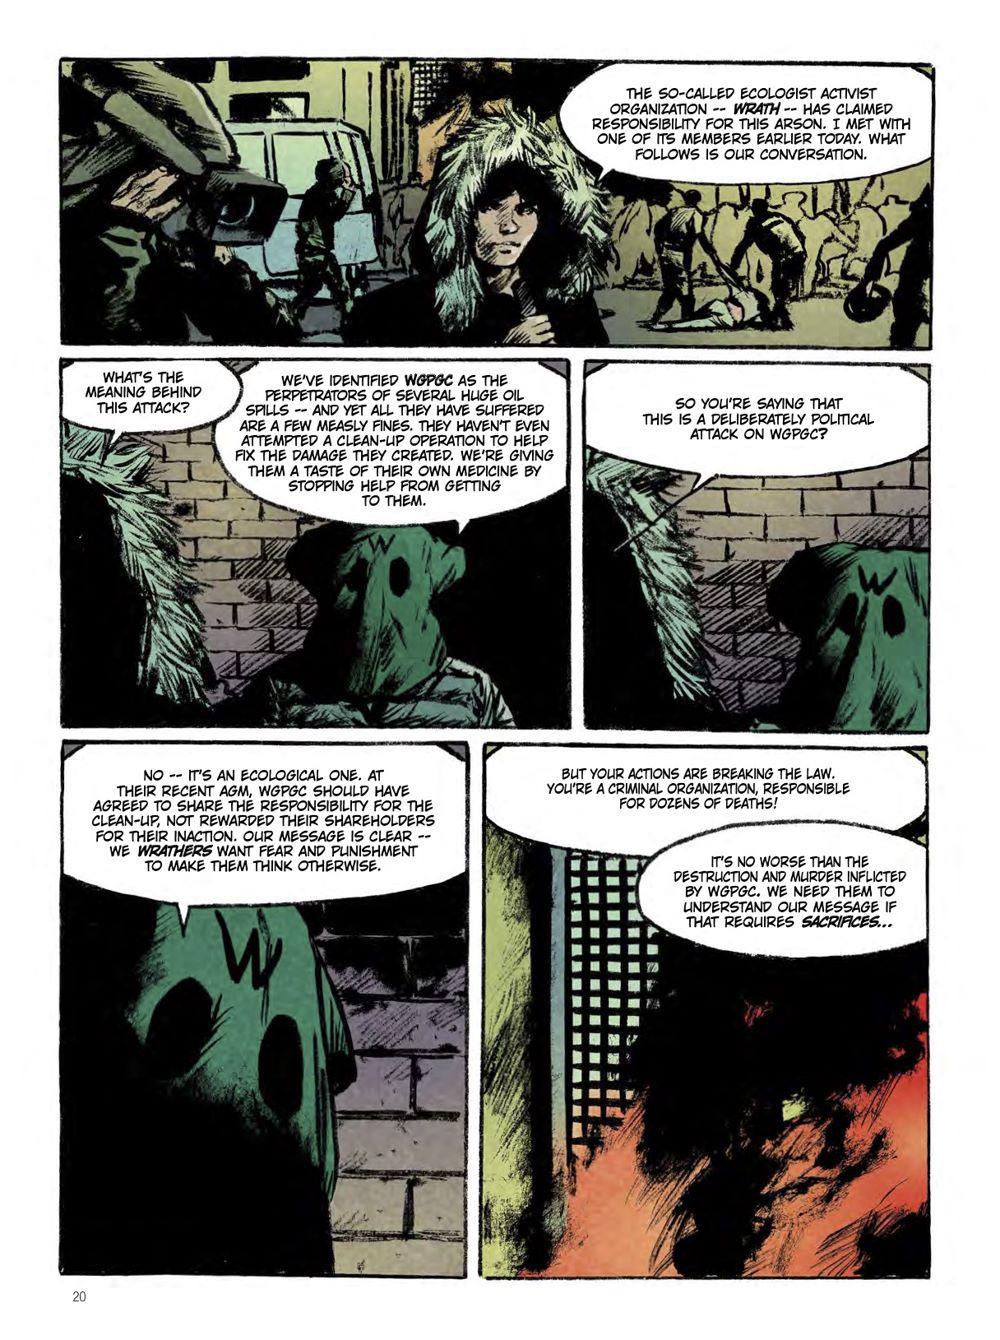 snowpiercer_the_prequel-extinction-1 ComicList Previews: SNOWPIERCER PREQUEL VOLUME 1 EXTINCTION GN